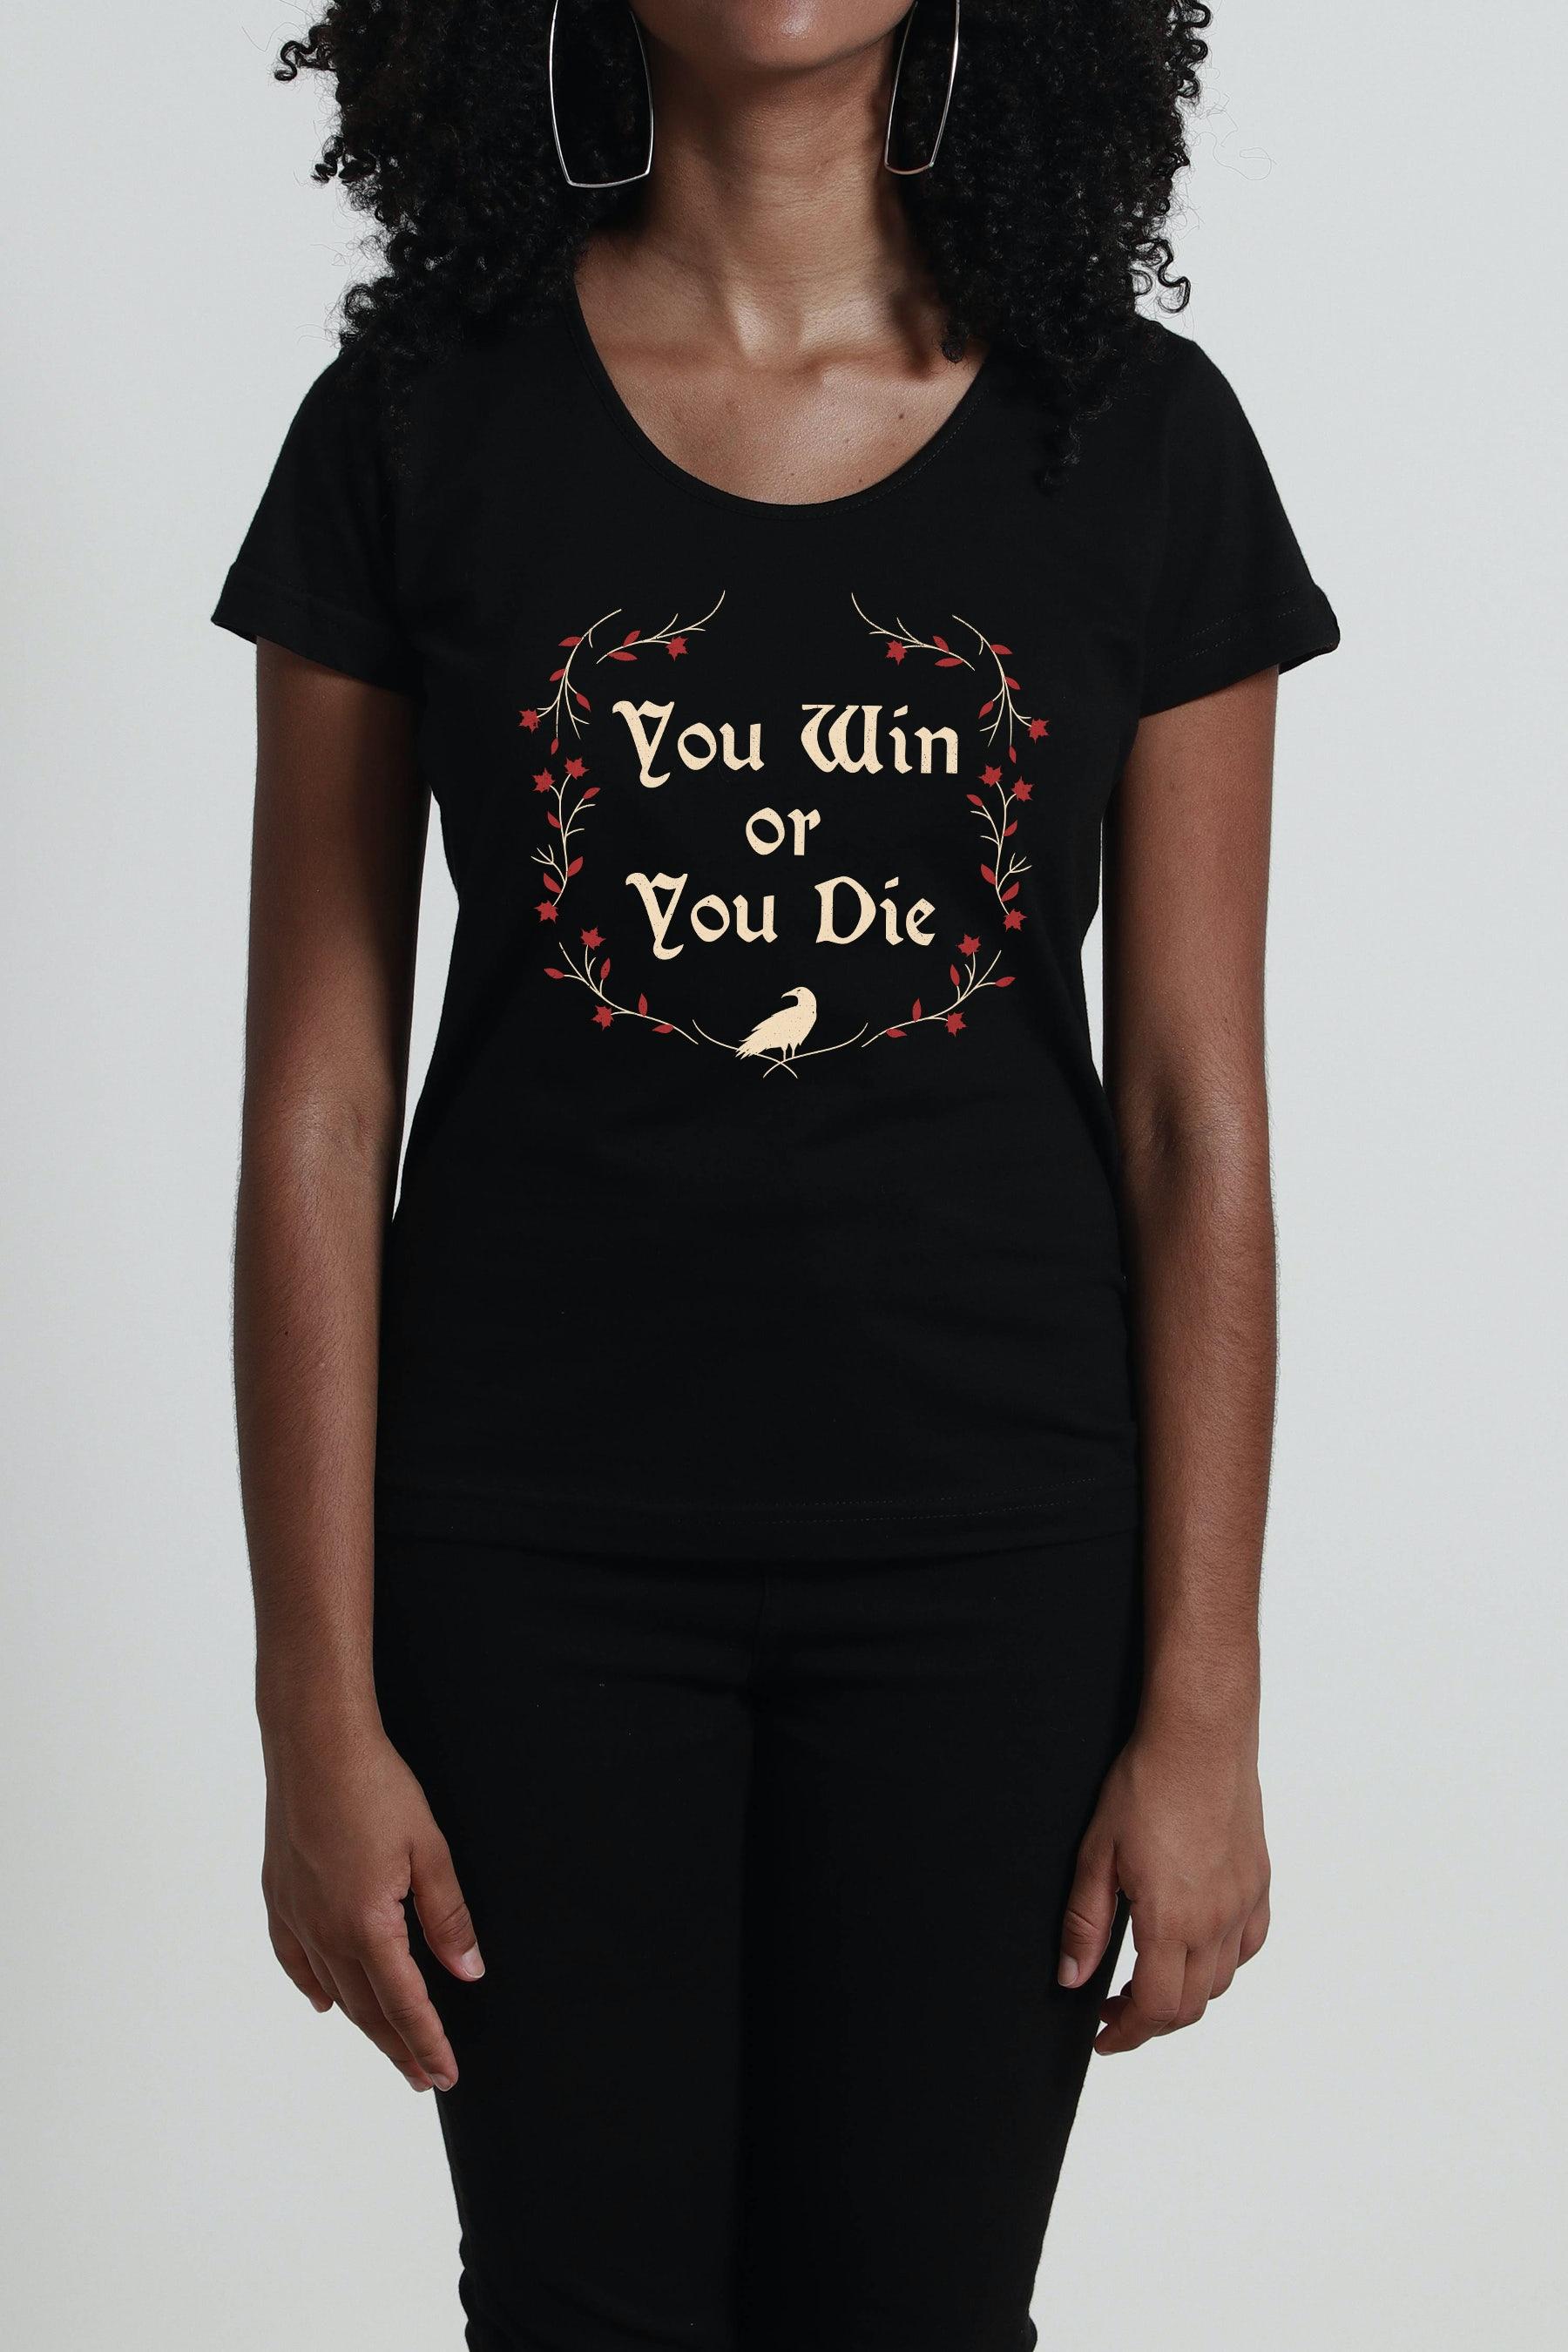 Camiseta You Win Or You Die